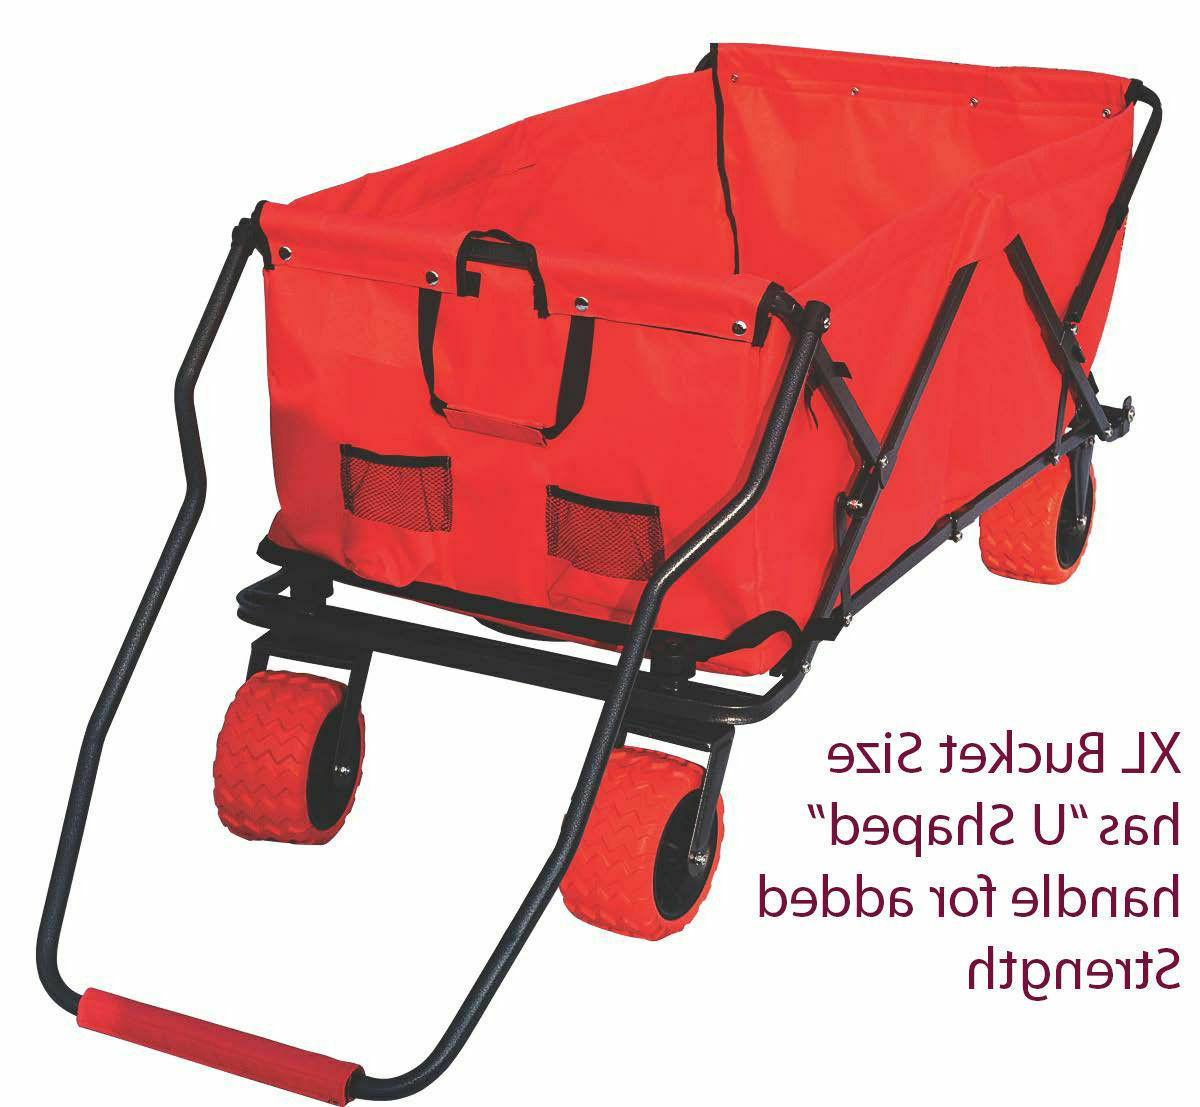 Folding Wagon Utility Cart Outdoor